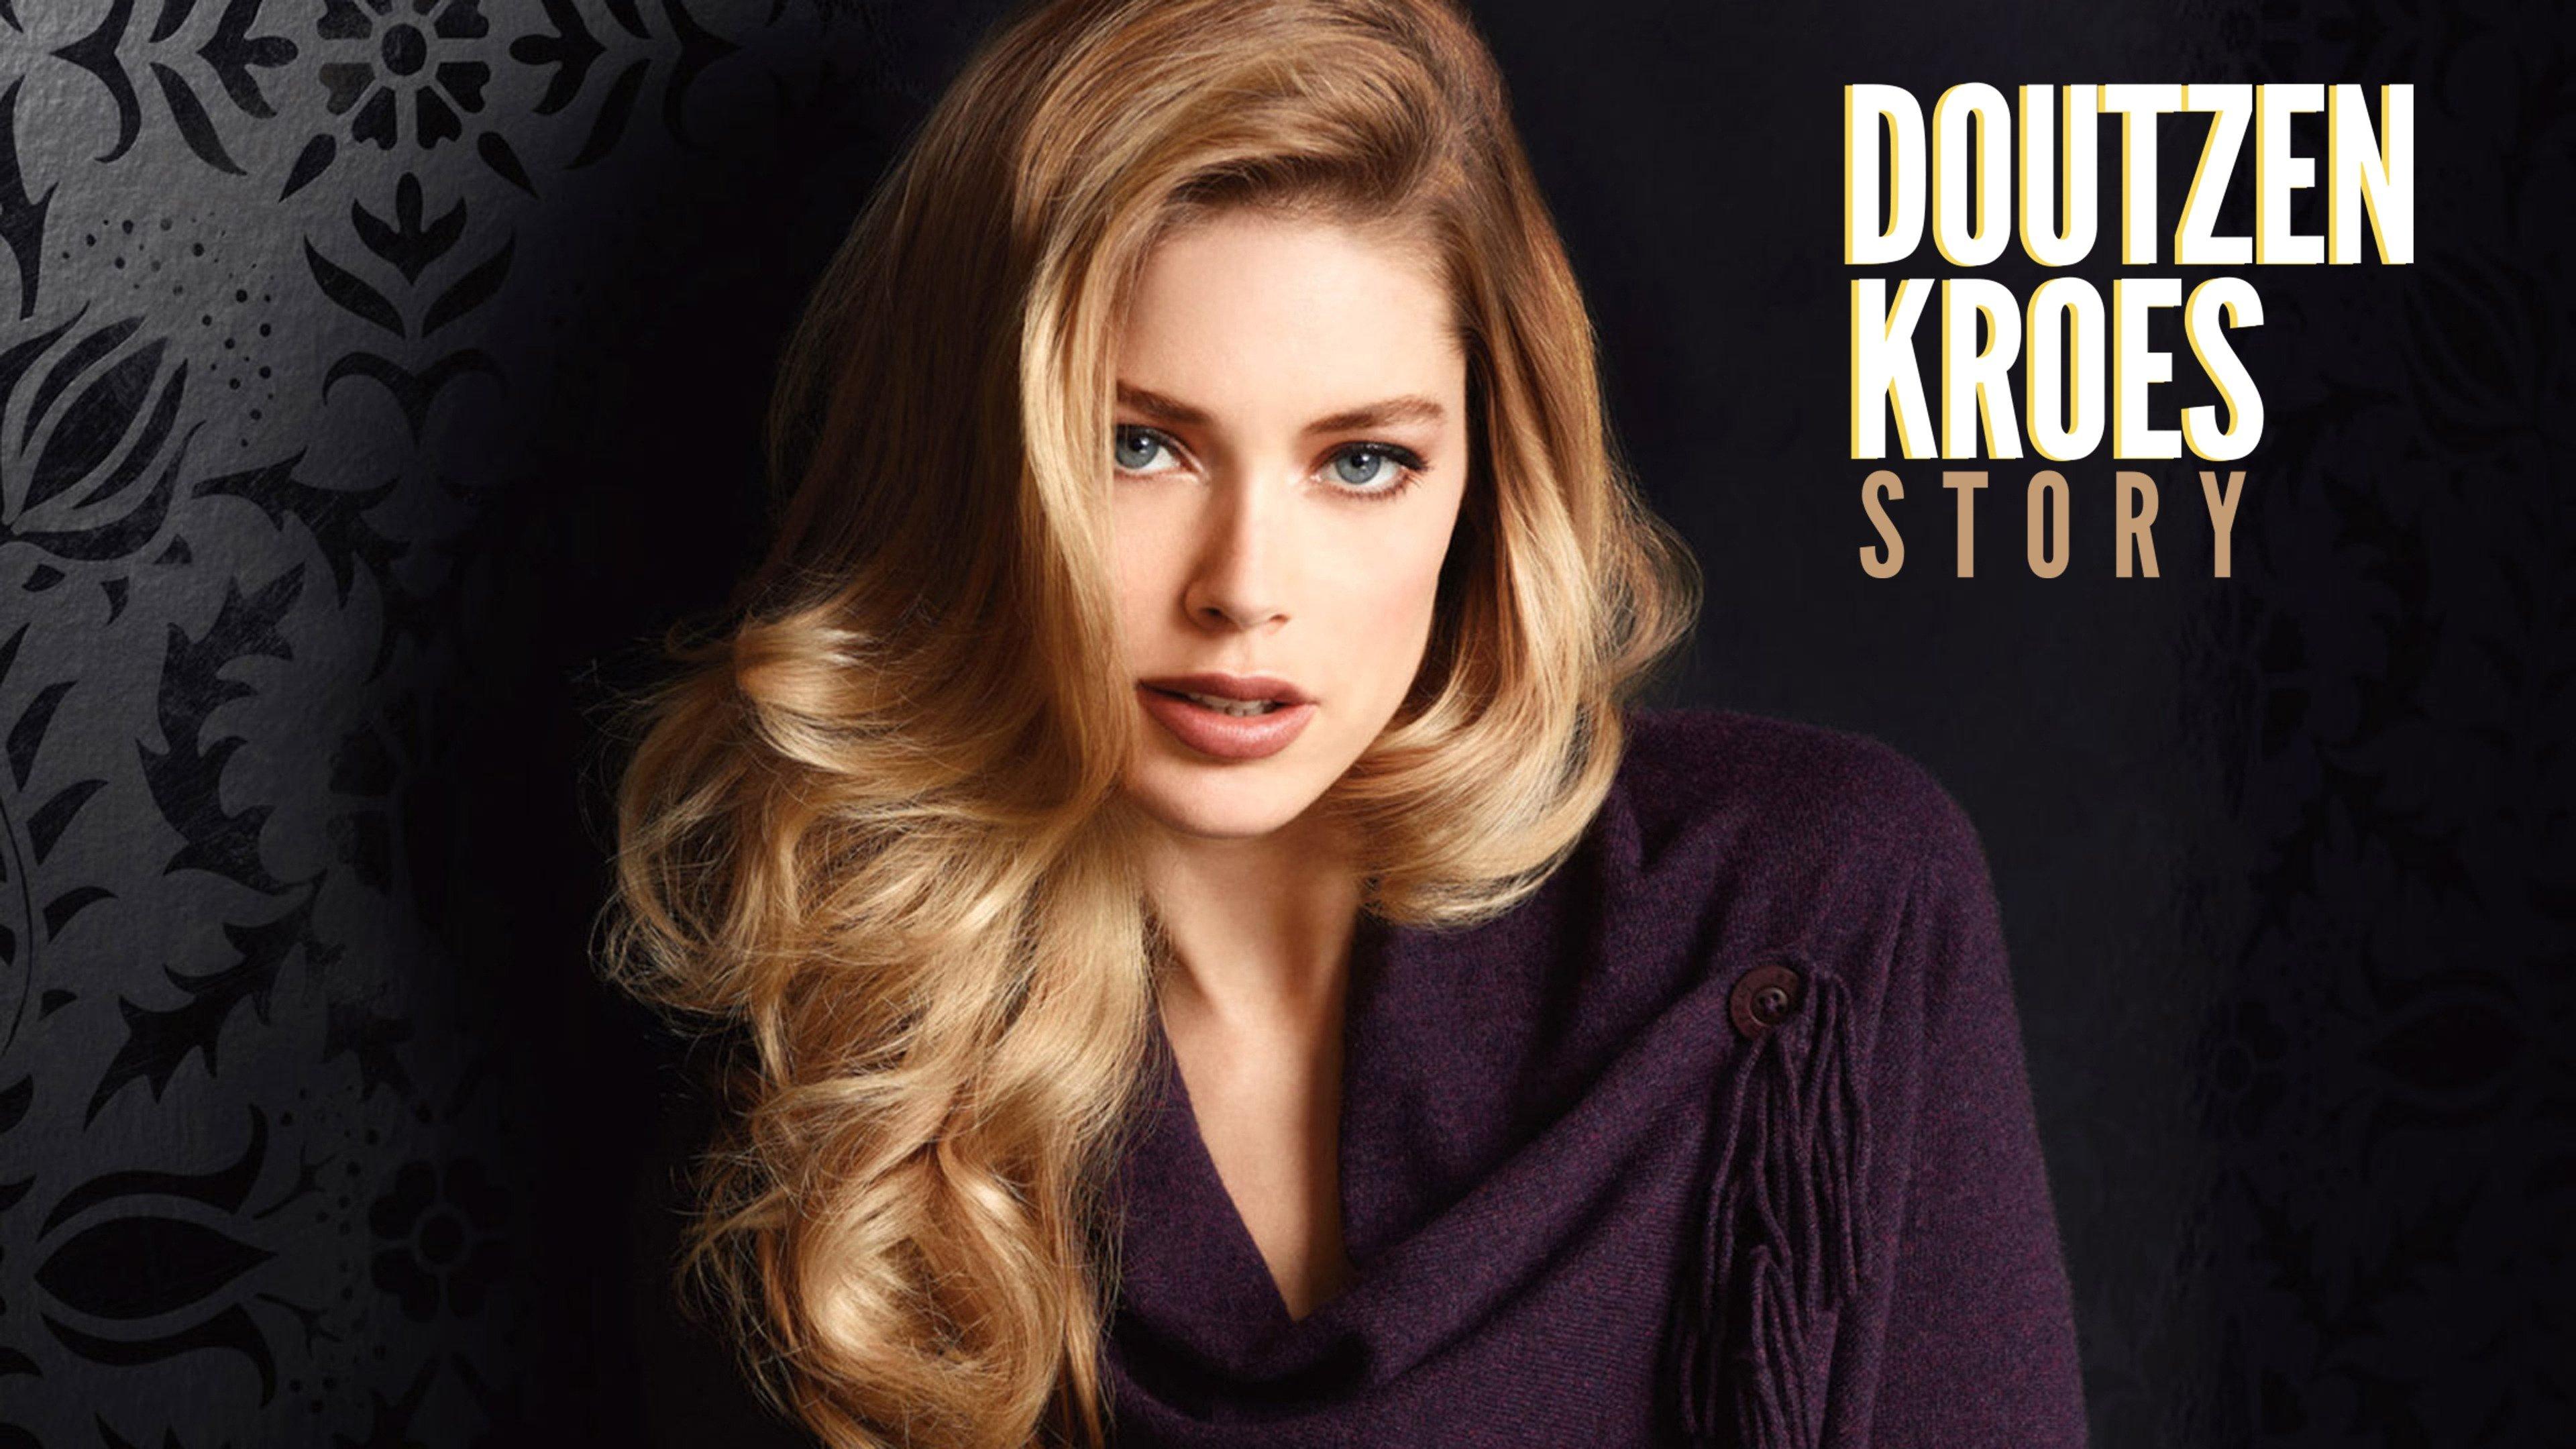 Doutzen Kroes Story